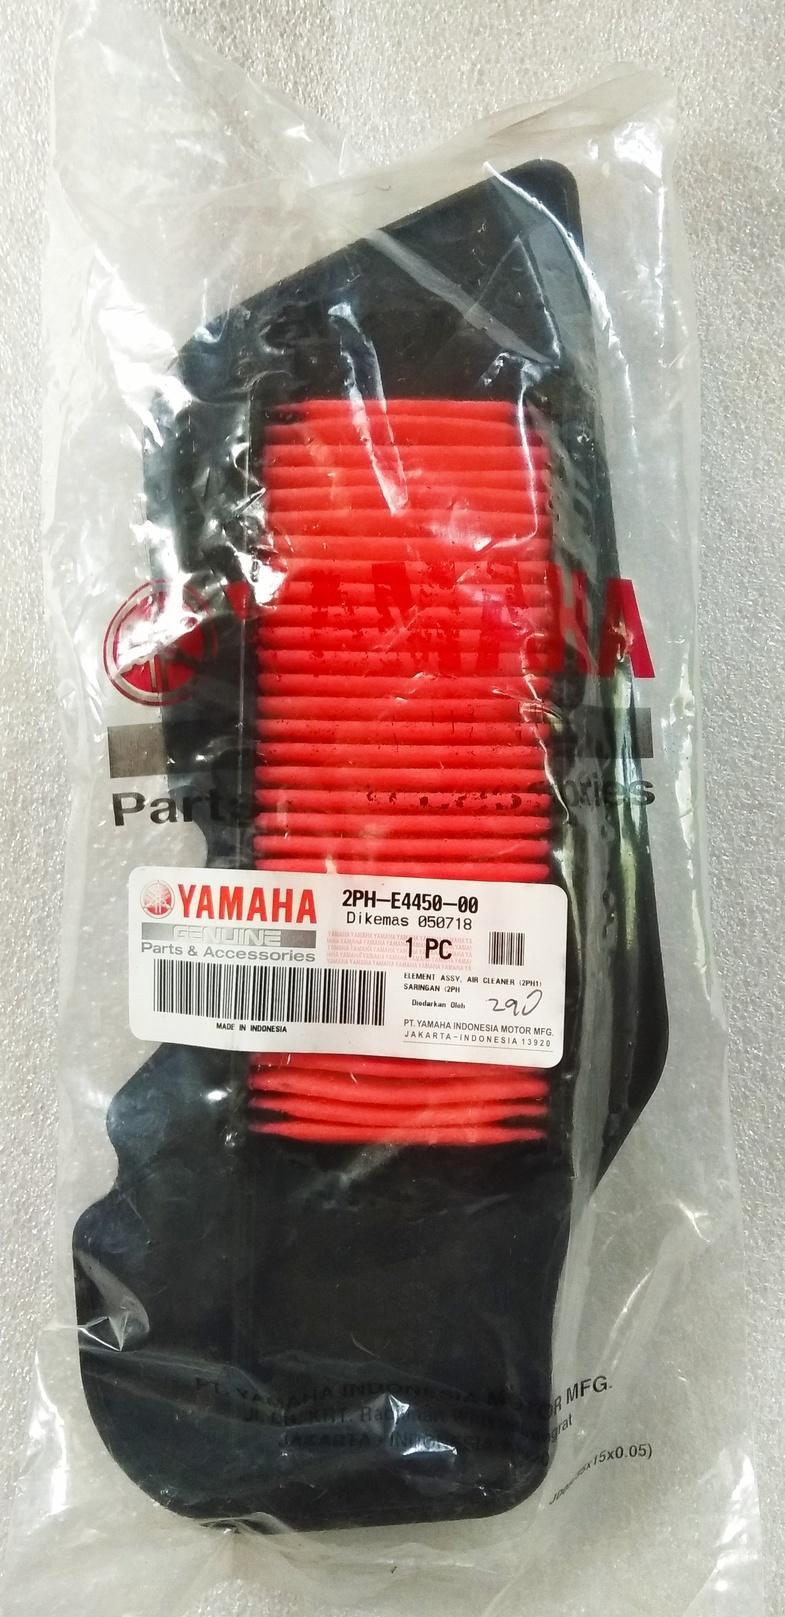 hight resolution of original yamaha air filter for mio i 125 mio soul i 125